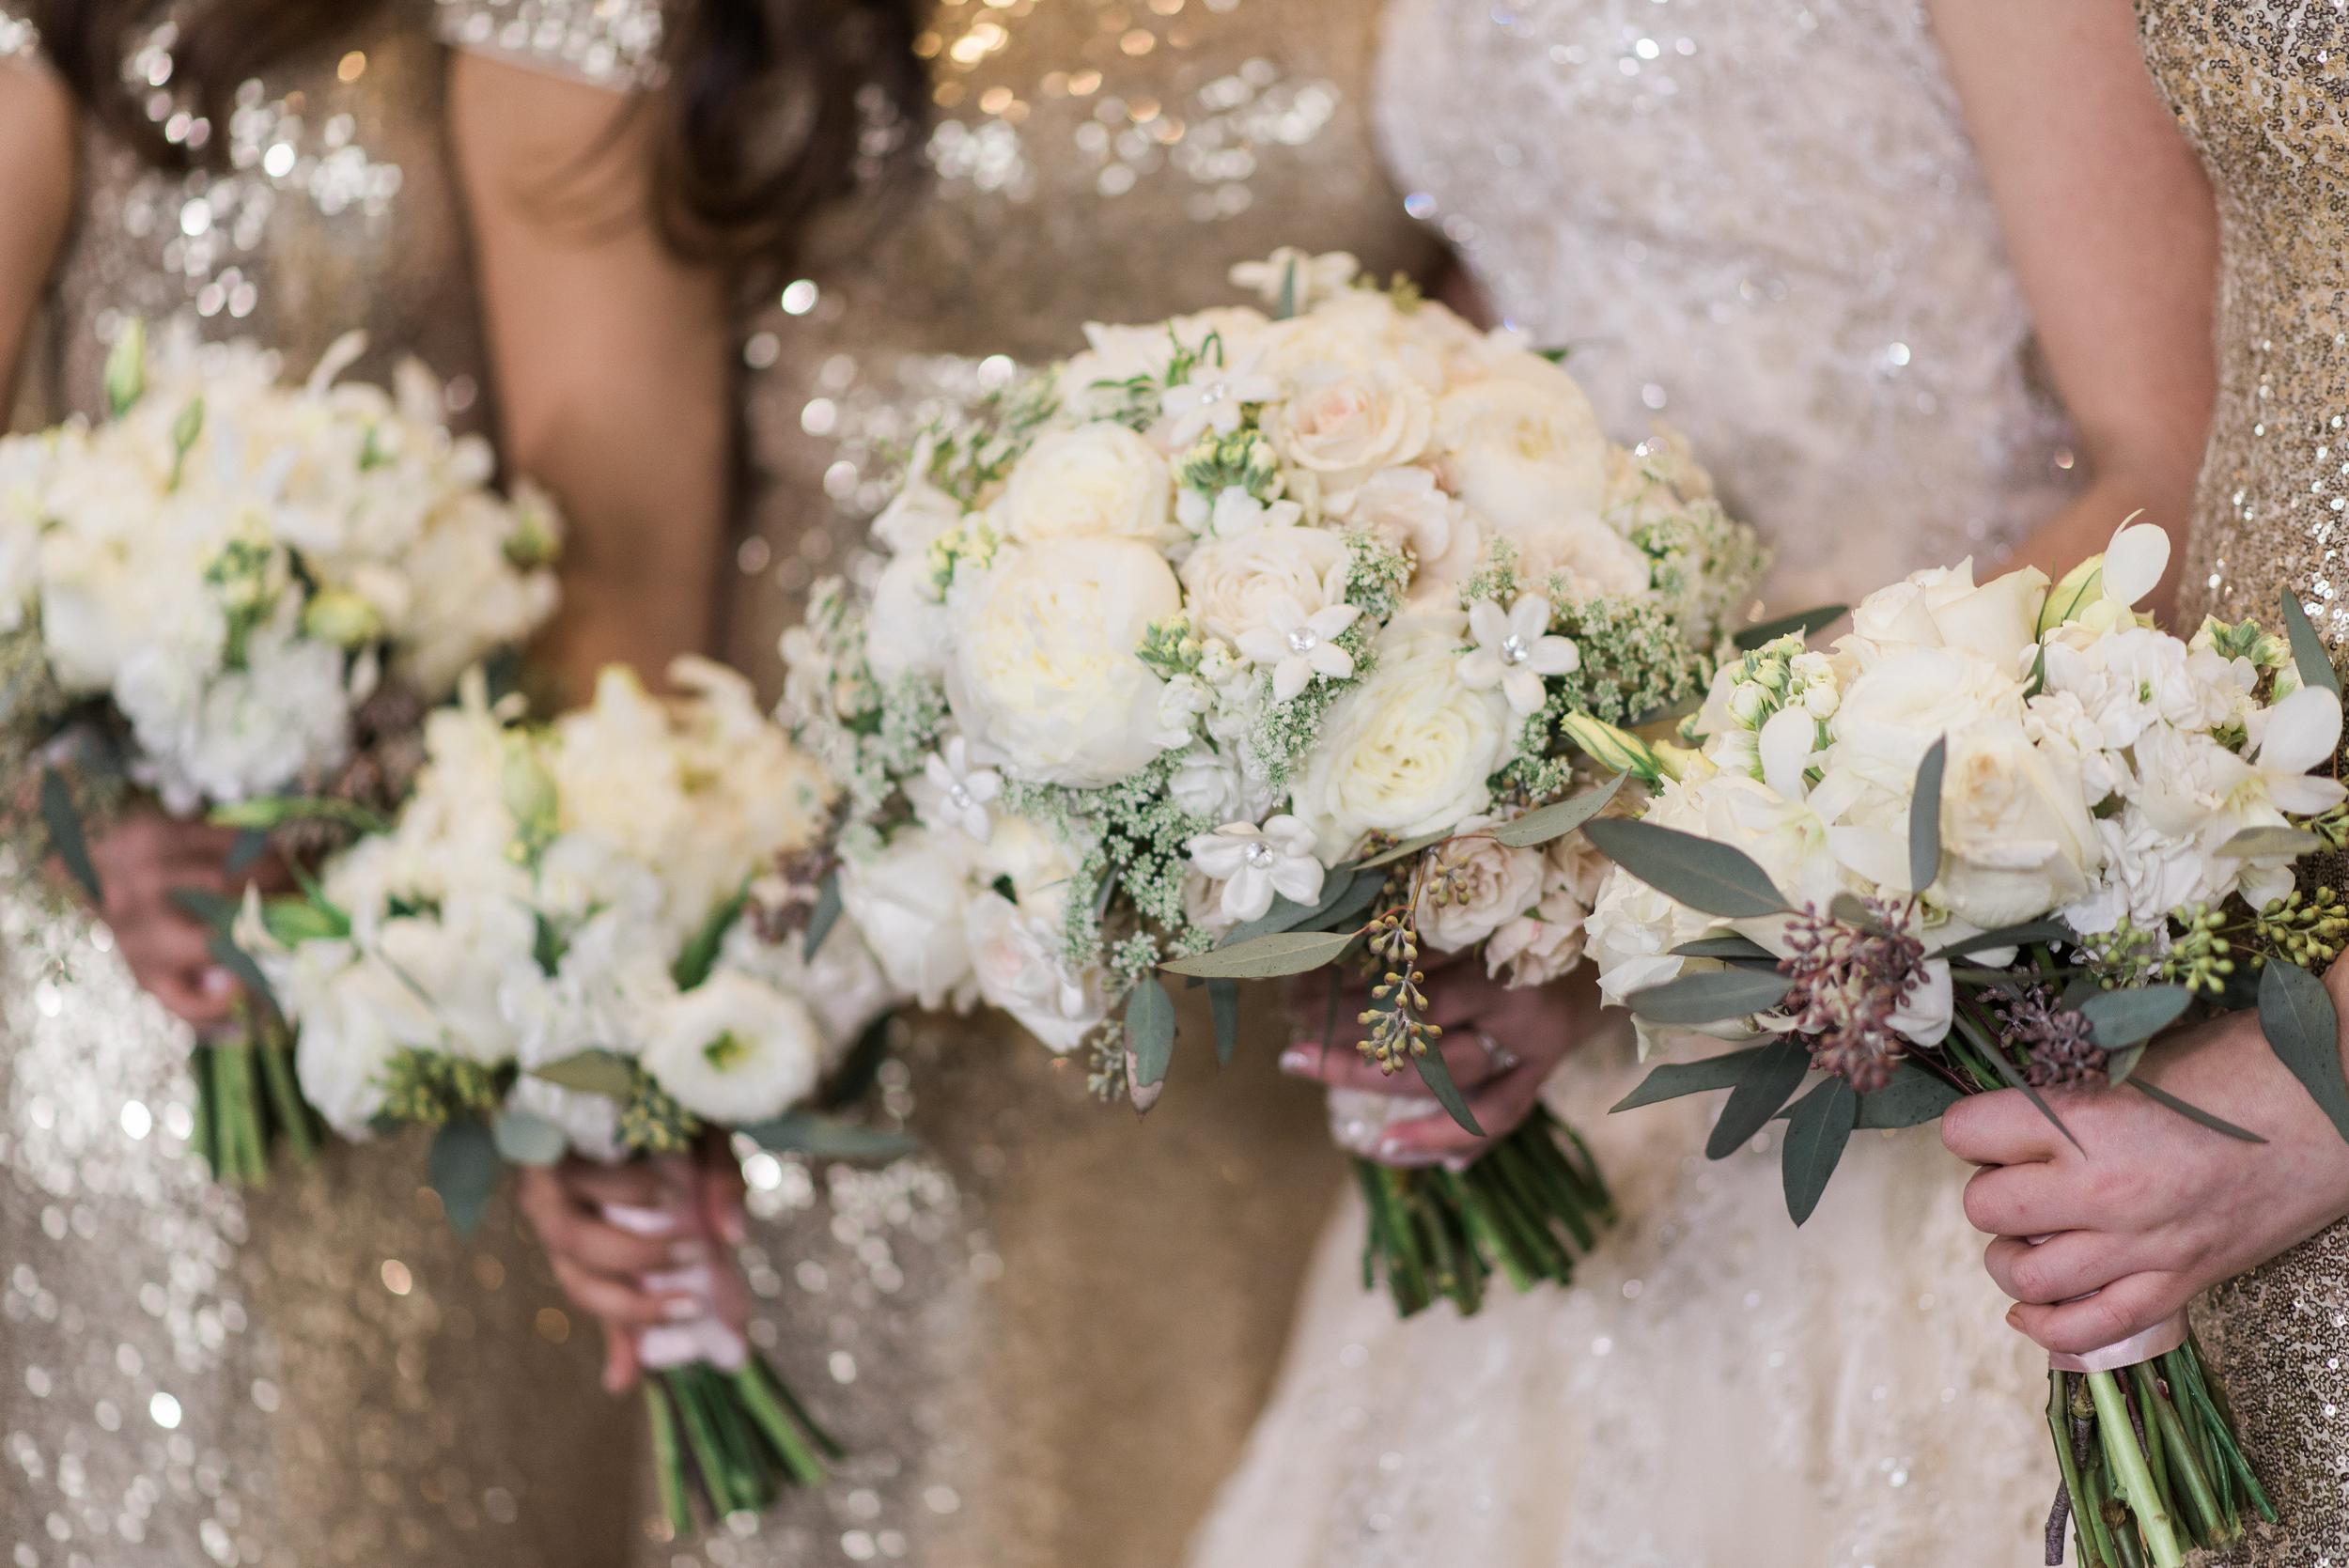 Gold Sequin Bridesmaid dresses. Rosehill Community Center Weddin